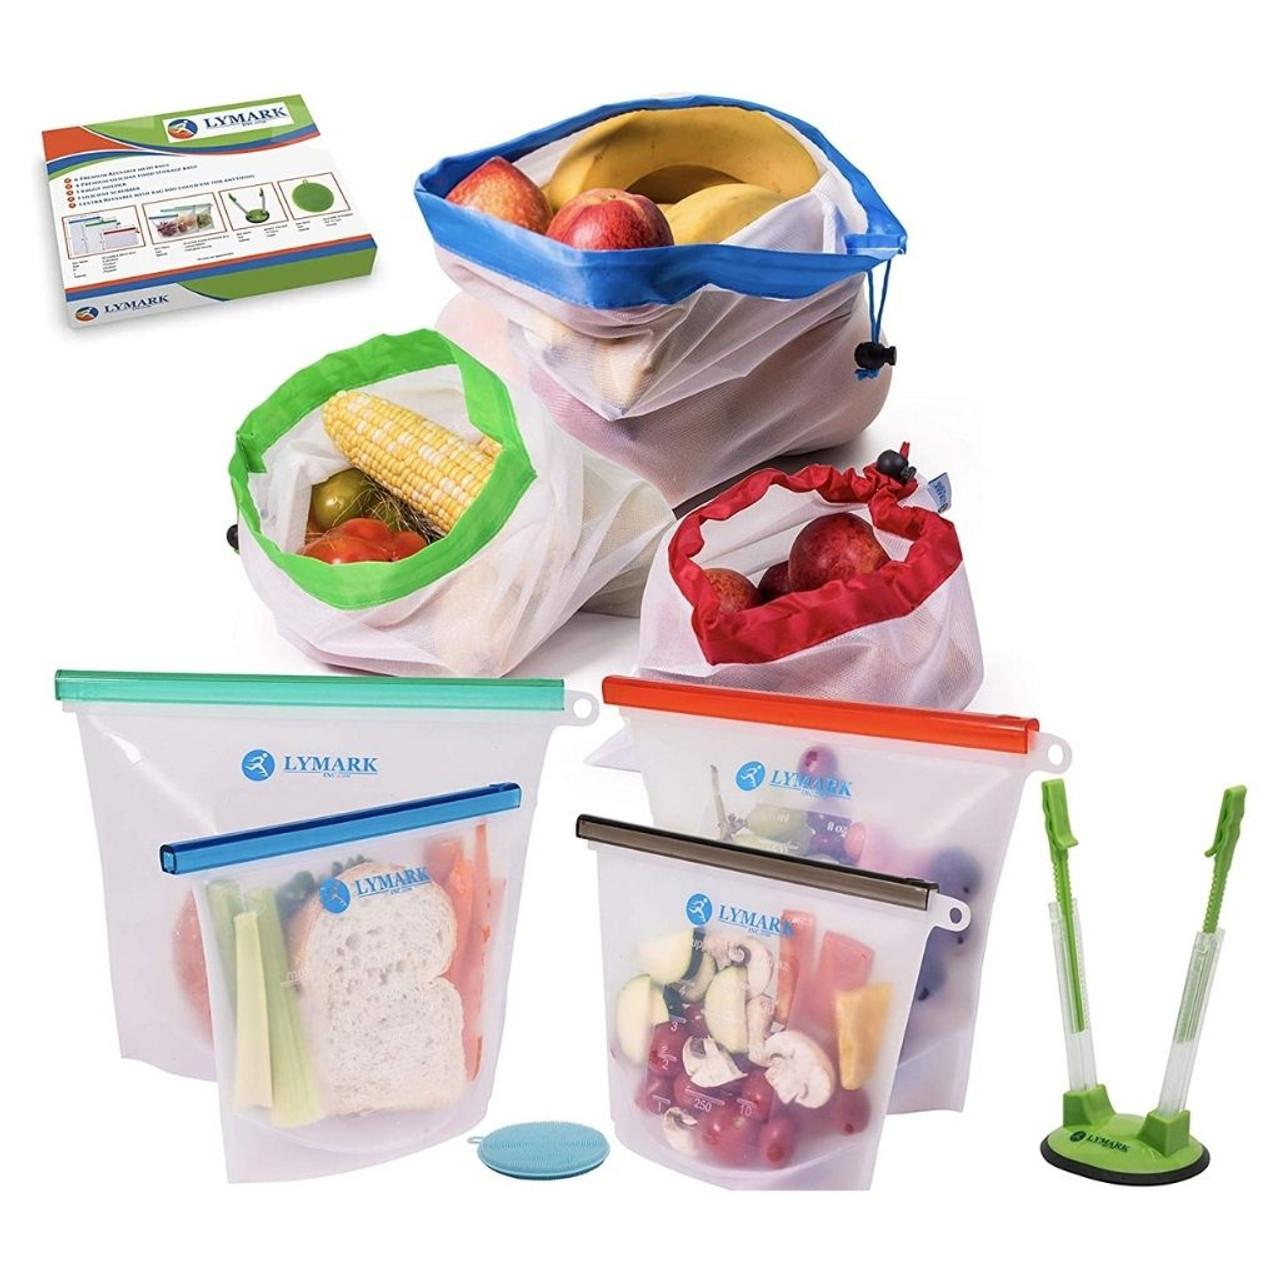 Reusable Leak Proof Silicone Food Storage and Mesh Produce Bag Set! .99 (REG .99) at Until Gone!